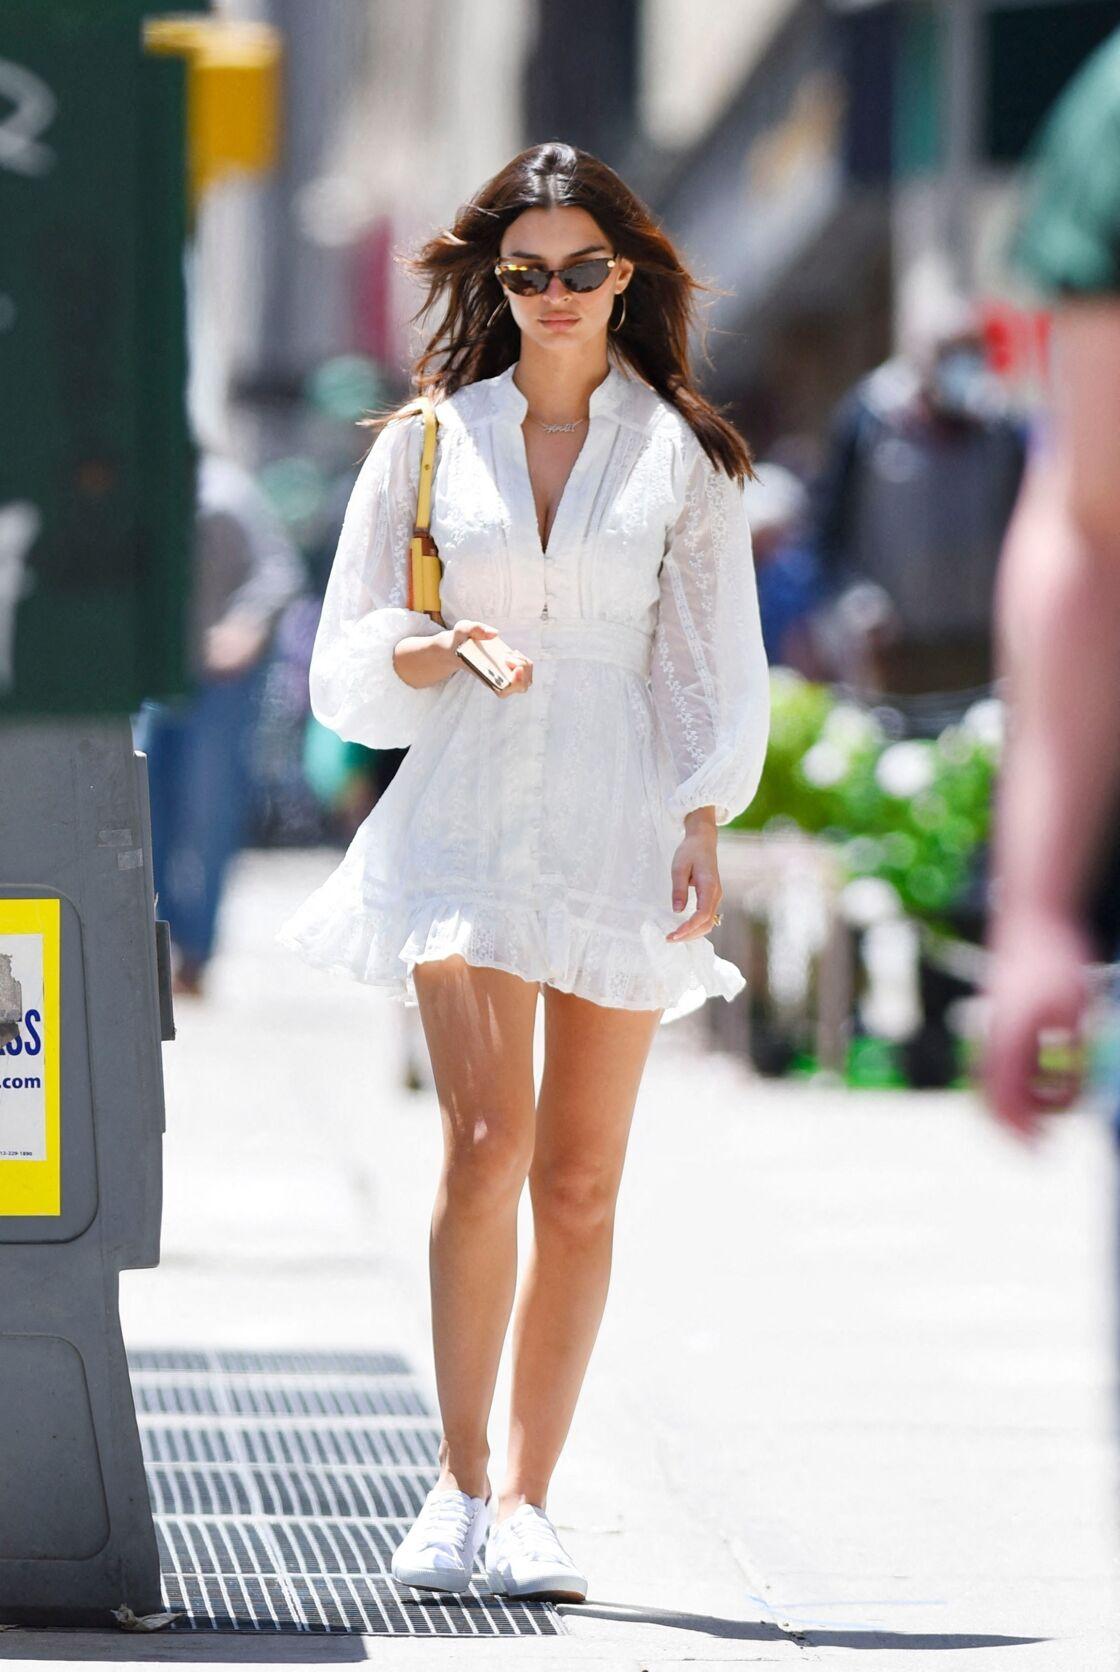 Emily Ratajkowski porte sa robe blanche avec une paires de sneakers